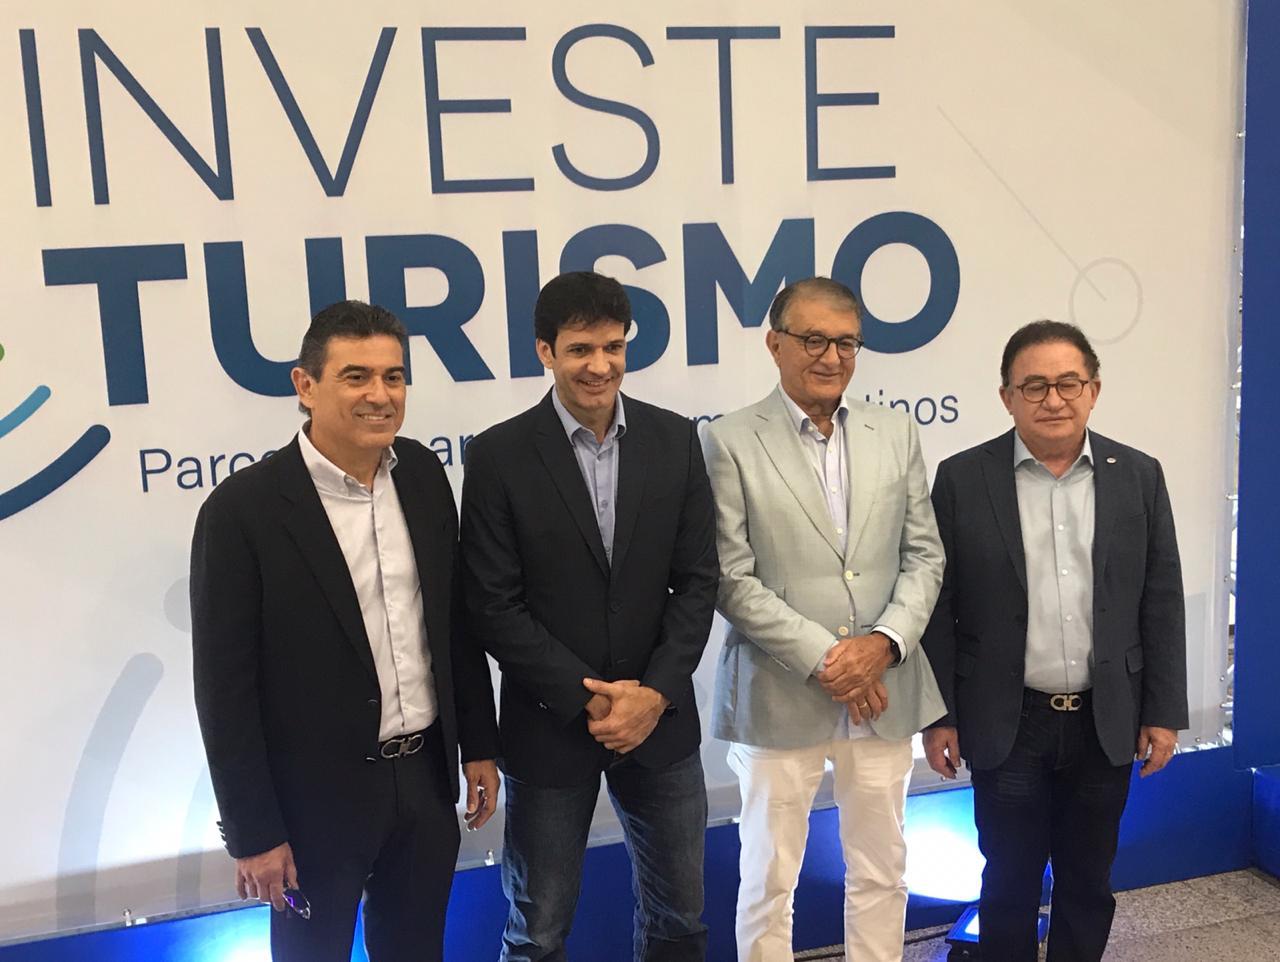 Ministro do Turismo do Brasil vem a Fortaleza lançar o Programa Investe Turismo